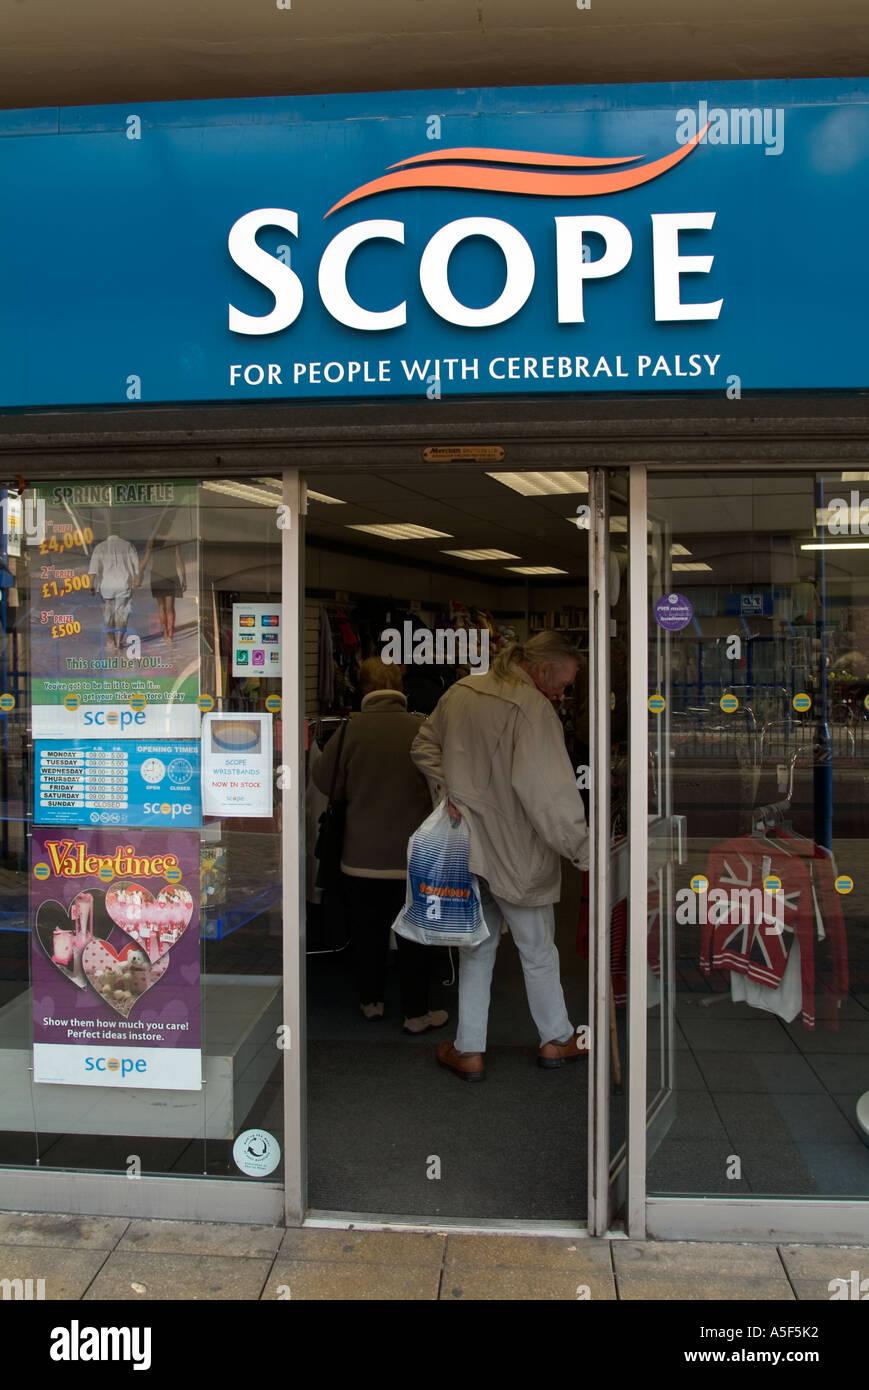 Facade of Scope charity shop Blackburn Lancashire UK - Stock Image